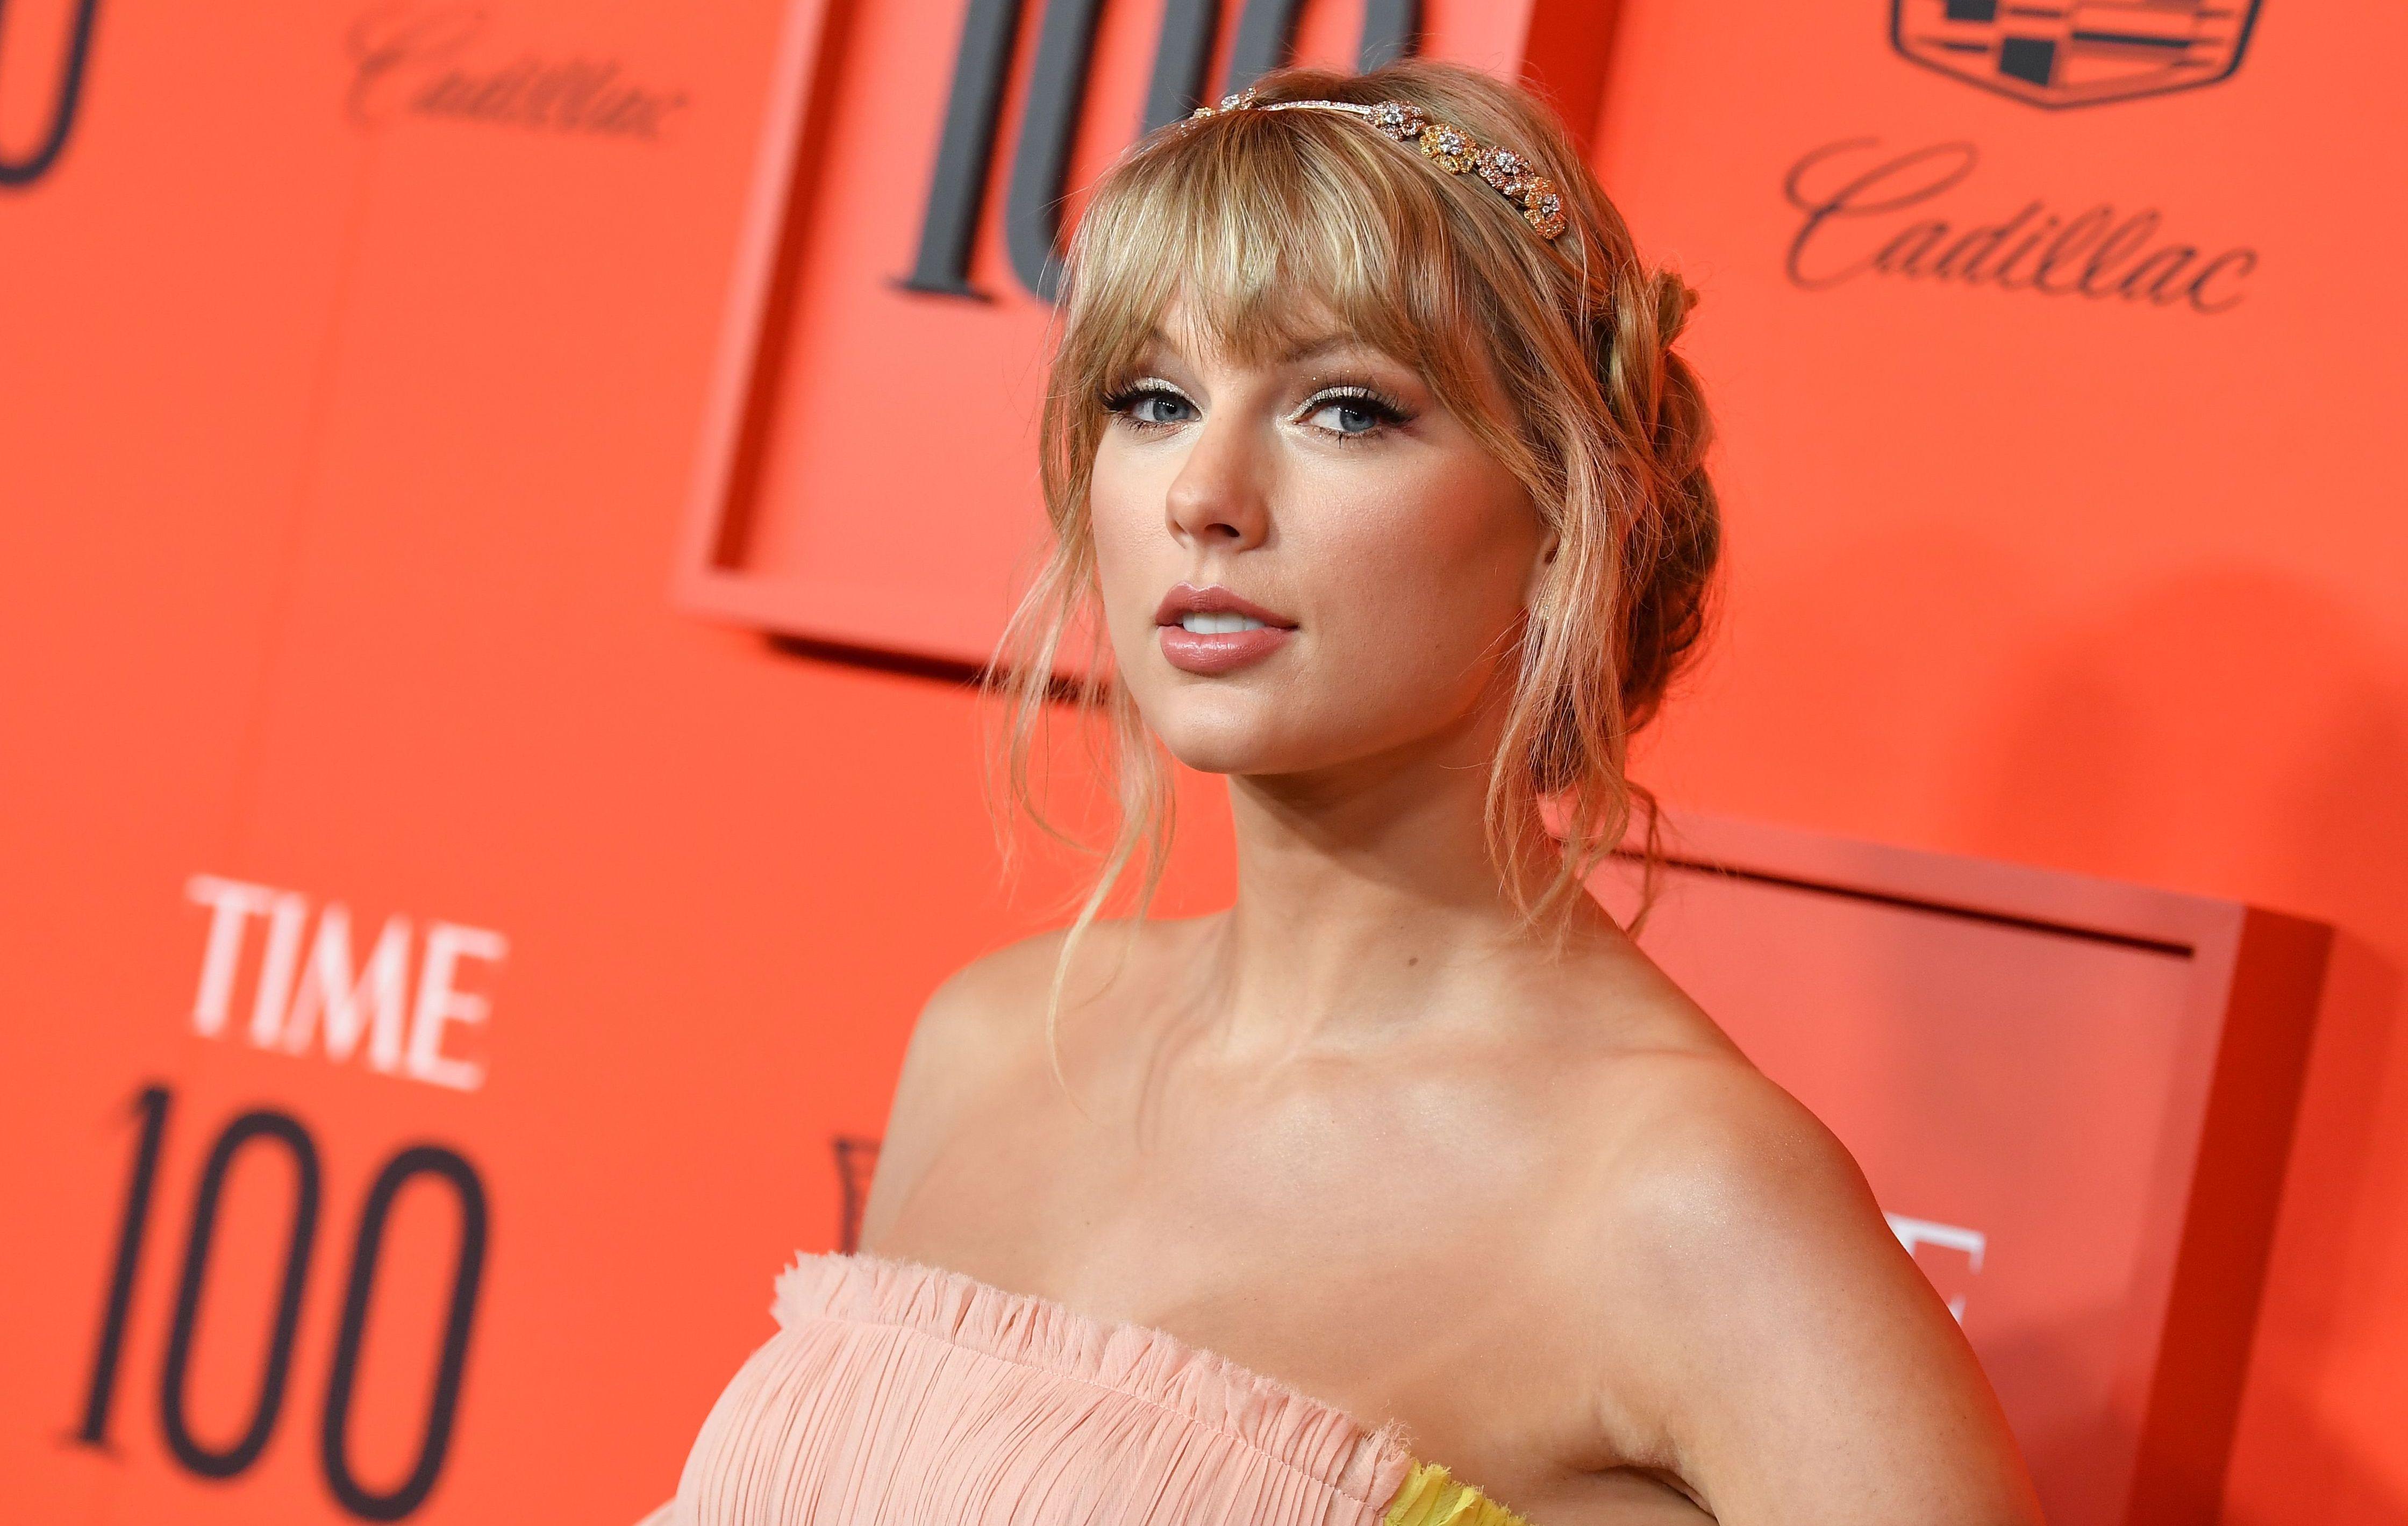 Taylor Swift Album Title Fan Theories Home Kaleidoscope More